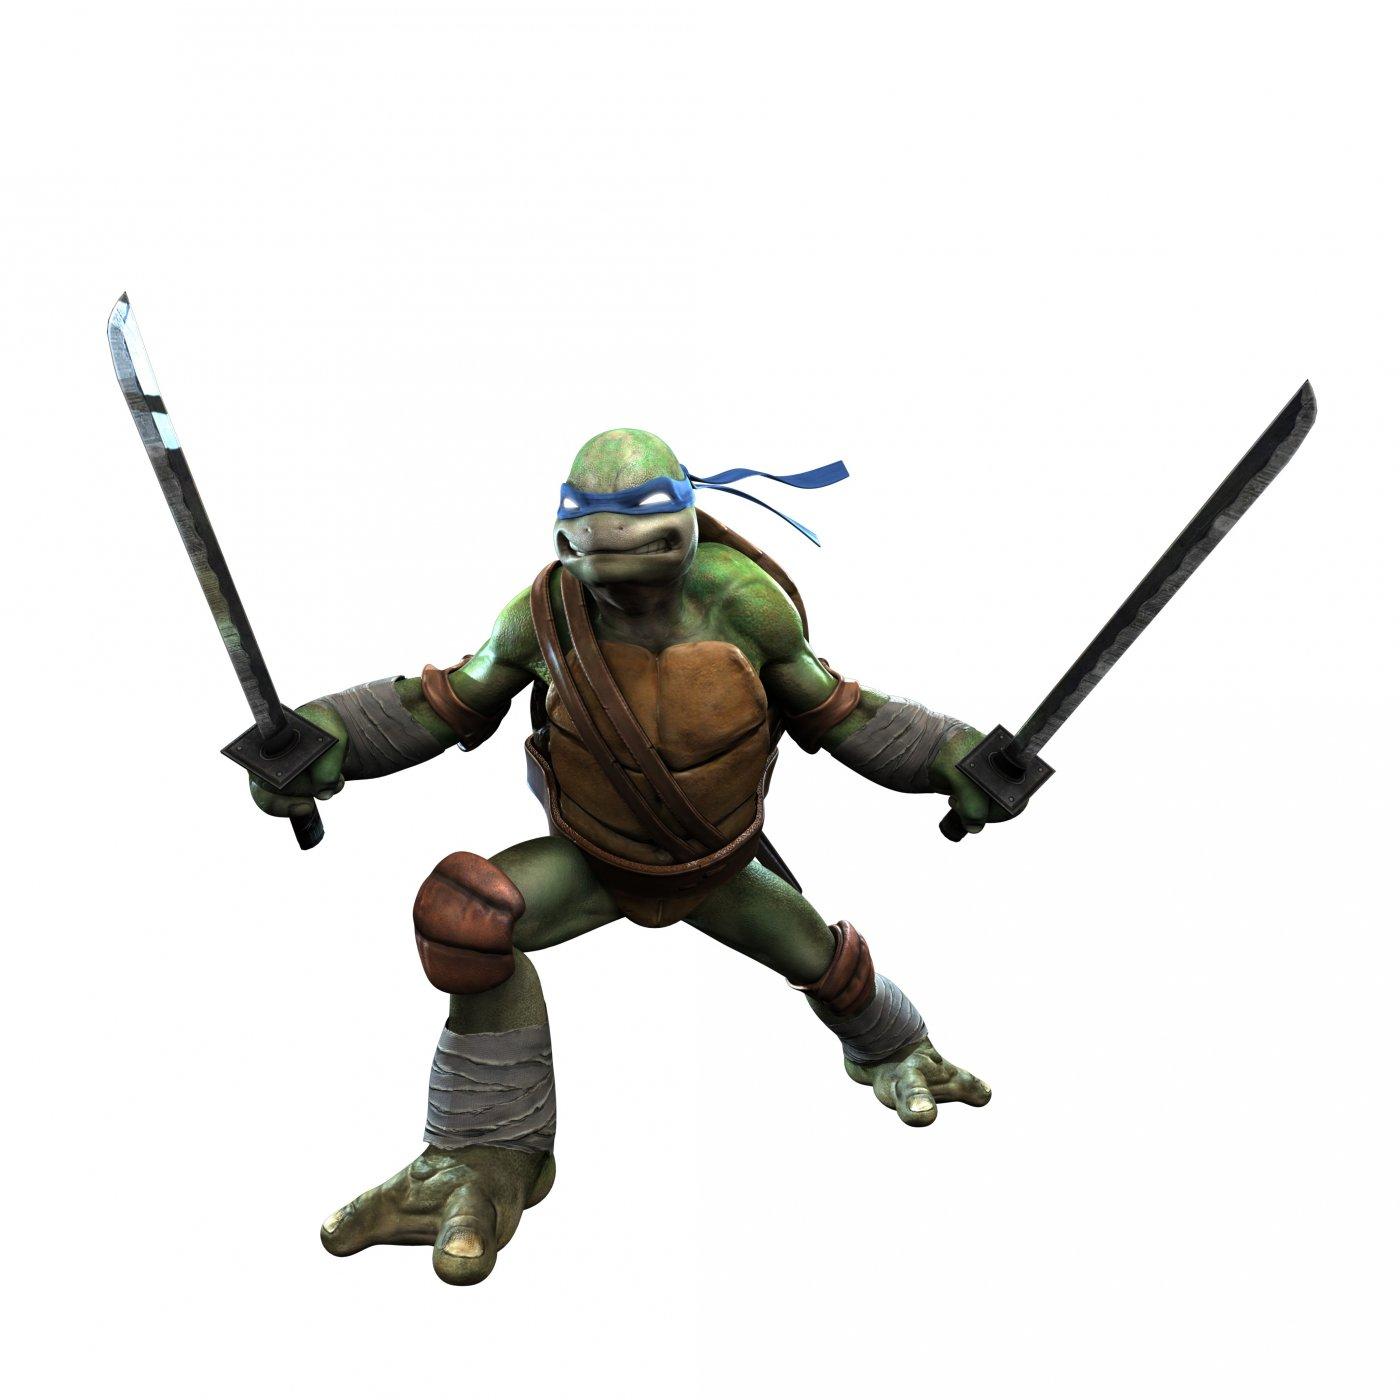 leo action jpg 1400x0 q85 لاکپشت ها در برابر نینجاها | پیش نمایش بازی TMNT: Out of the Shadows